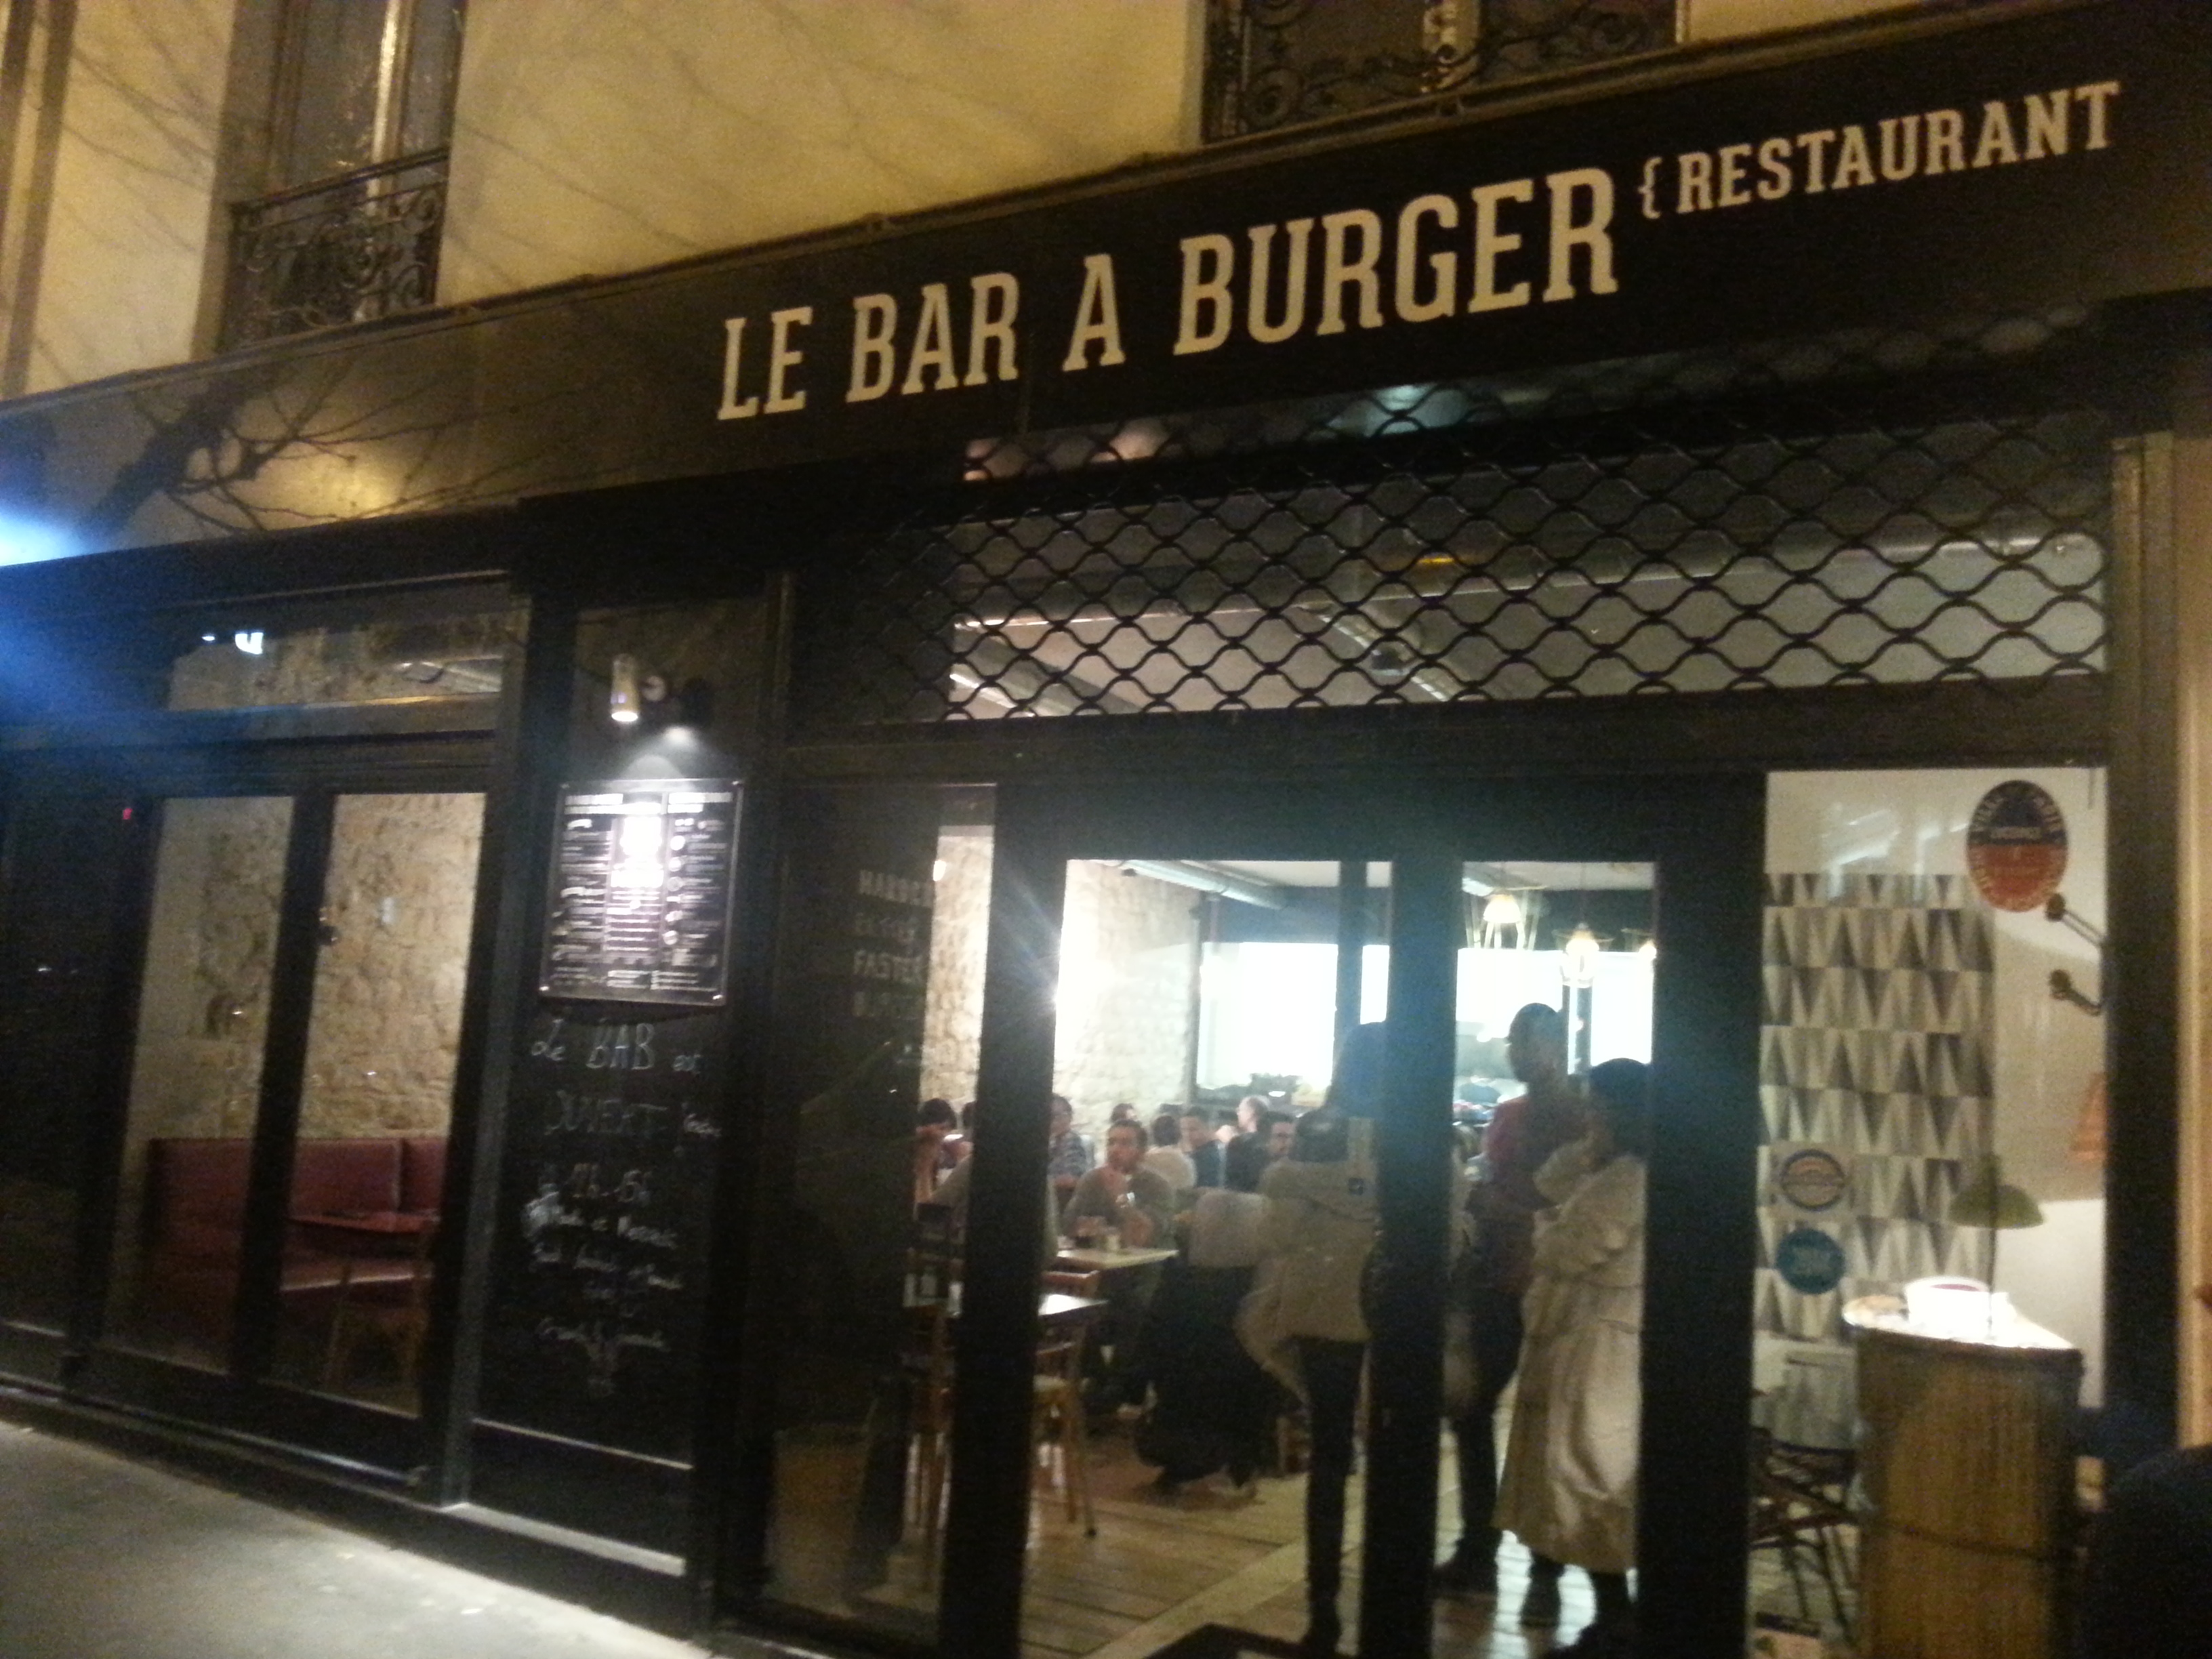 le bab bar burger restaurant fran ais paris le bab burger bar french restaurant in. Black Bedroom Furniture Sets. Home Design Ideas